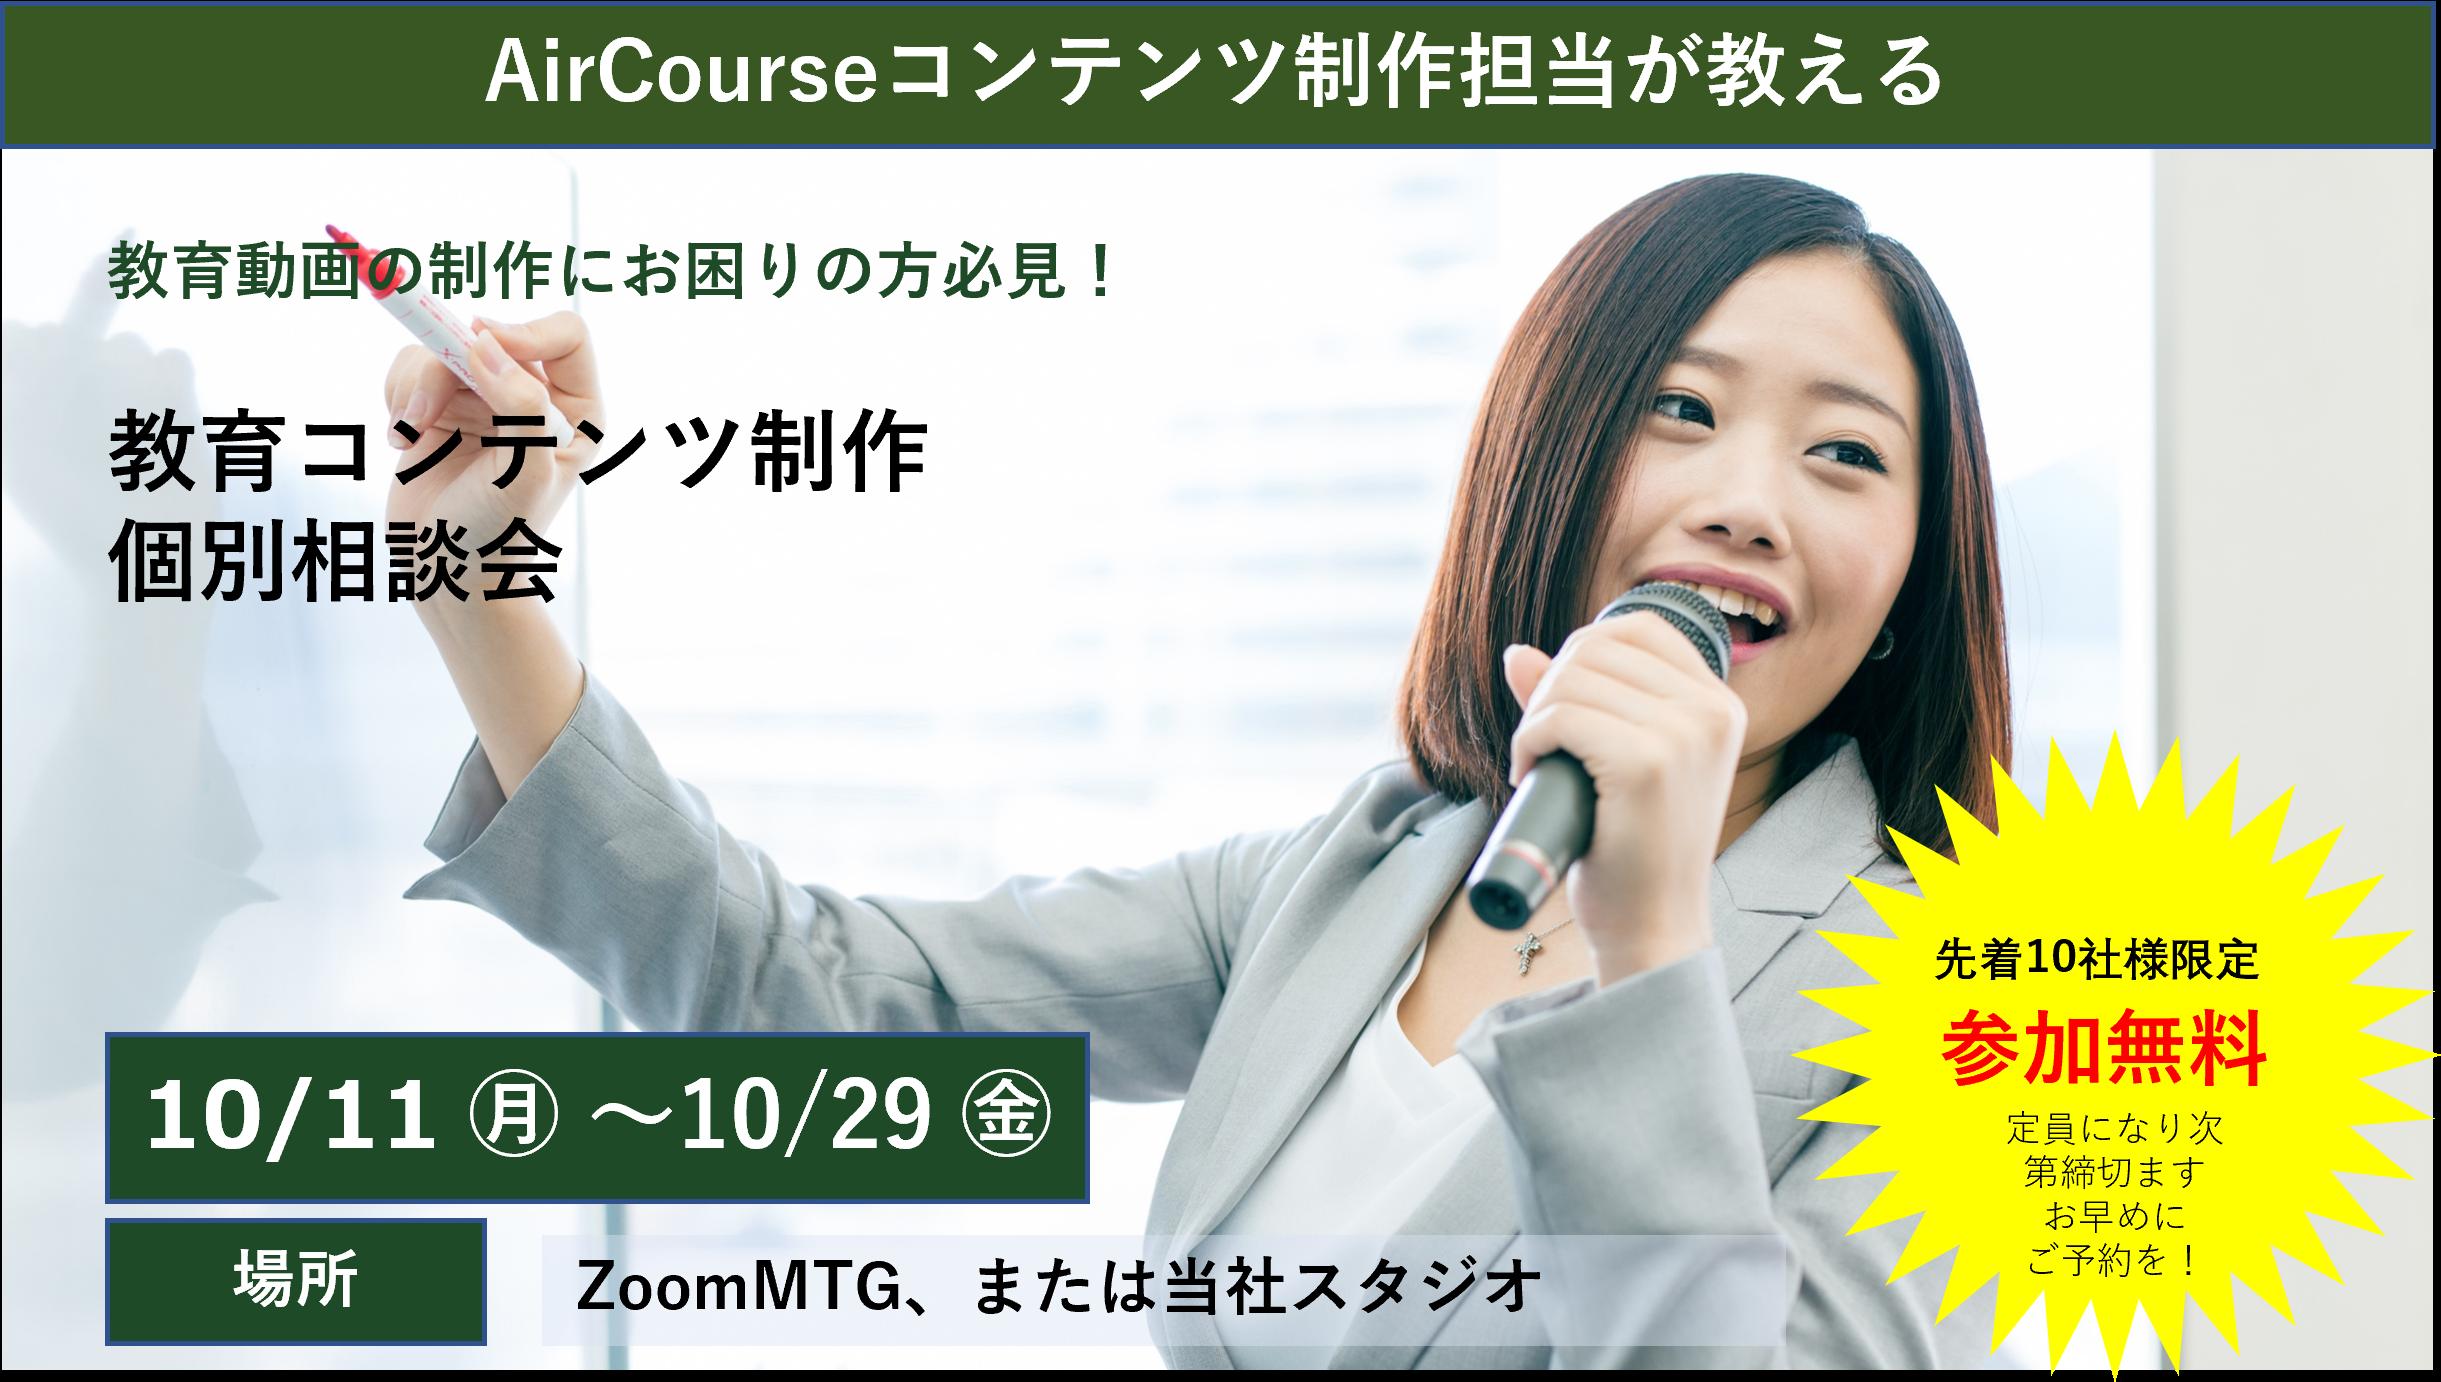 AirCourseコンテンツ制作担当が教える「教育コンテンツ制作 個別相談会」を開催!